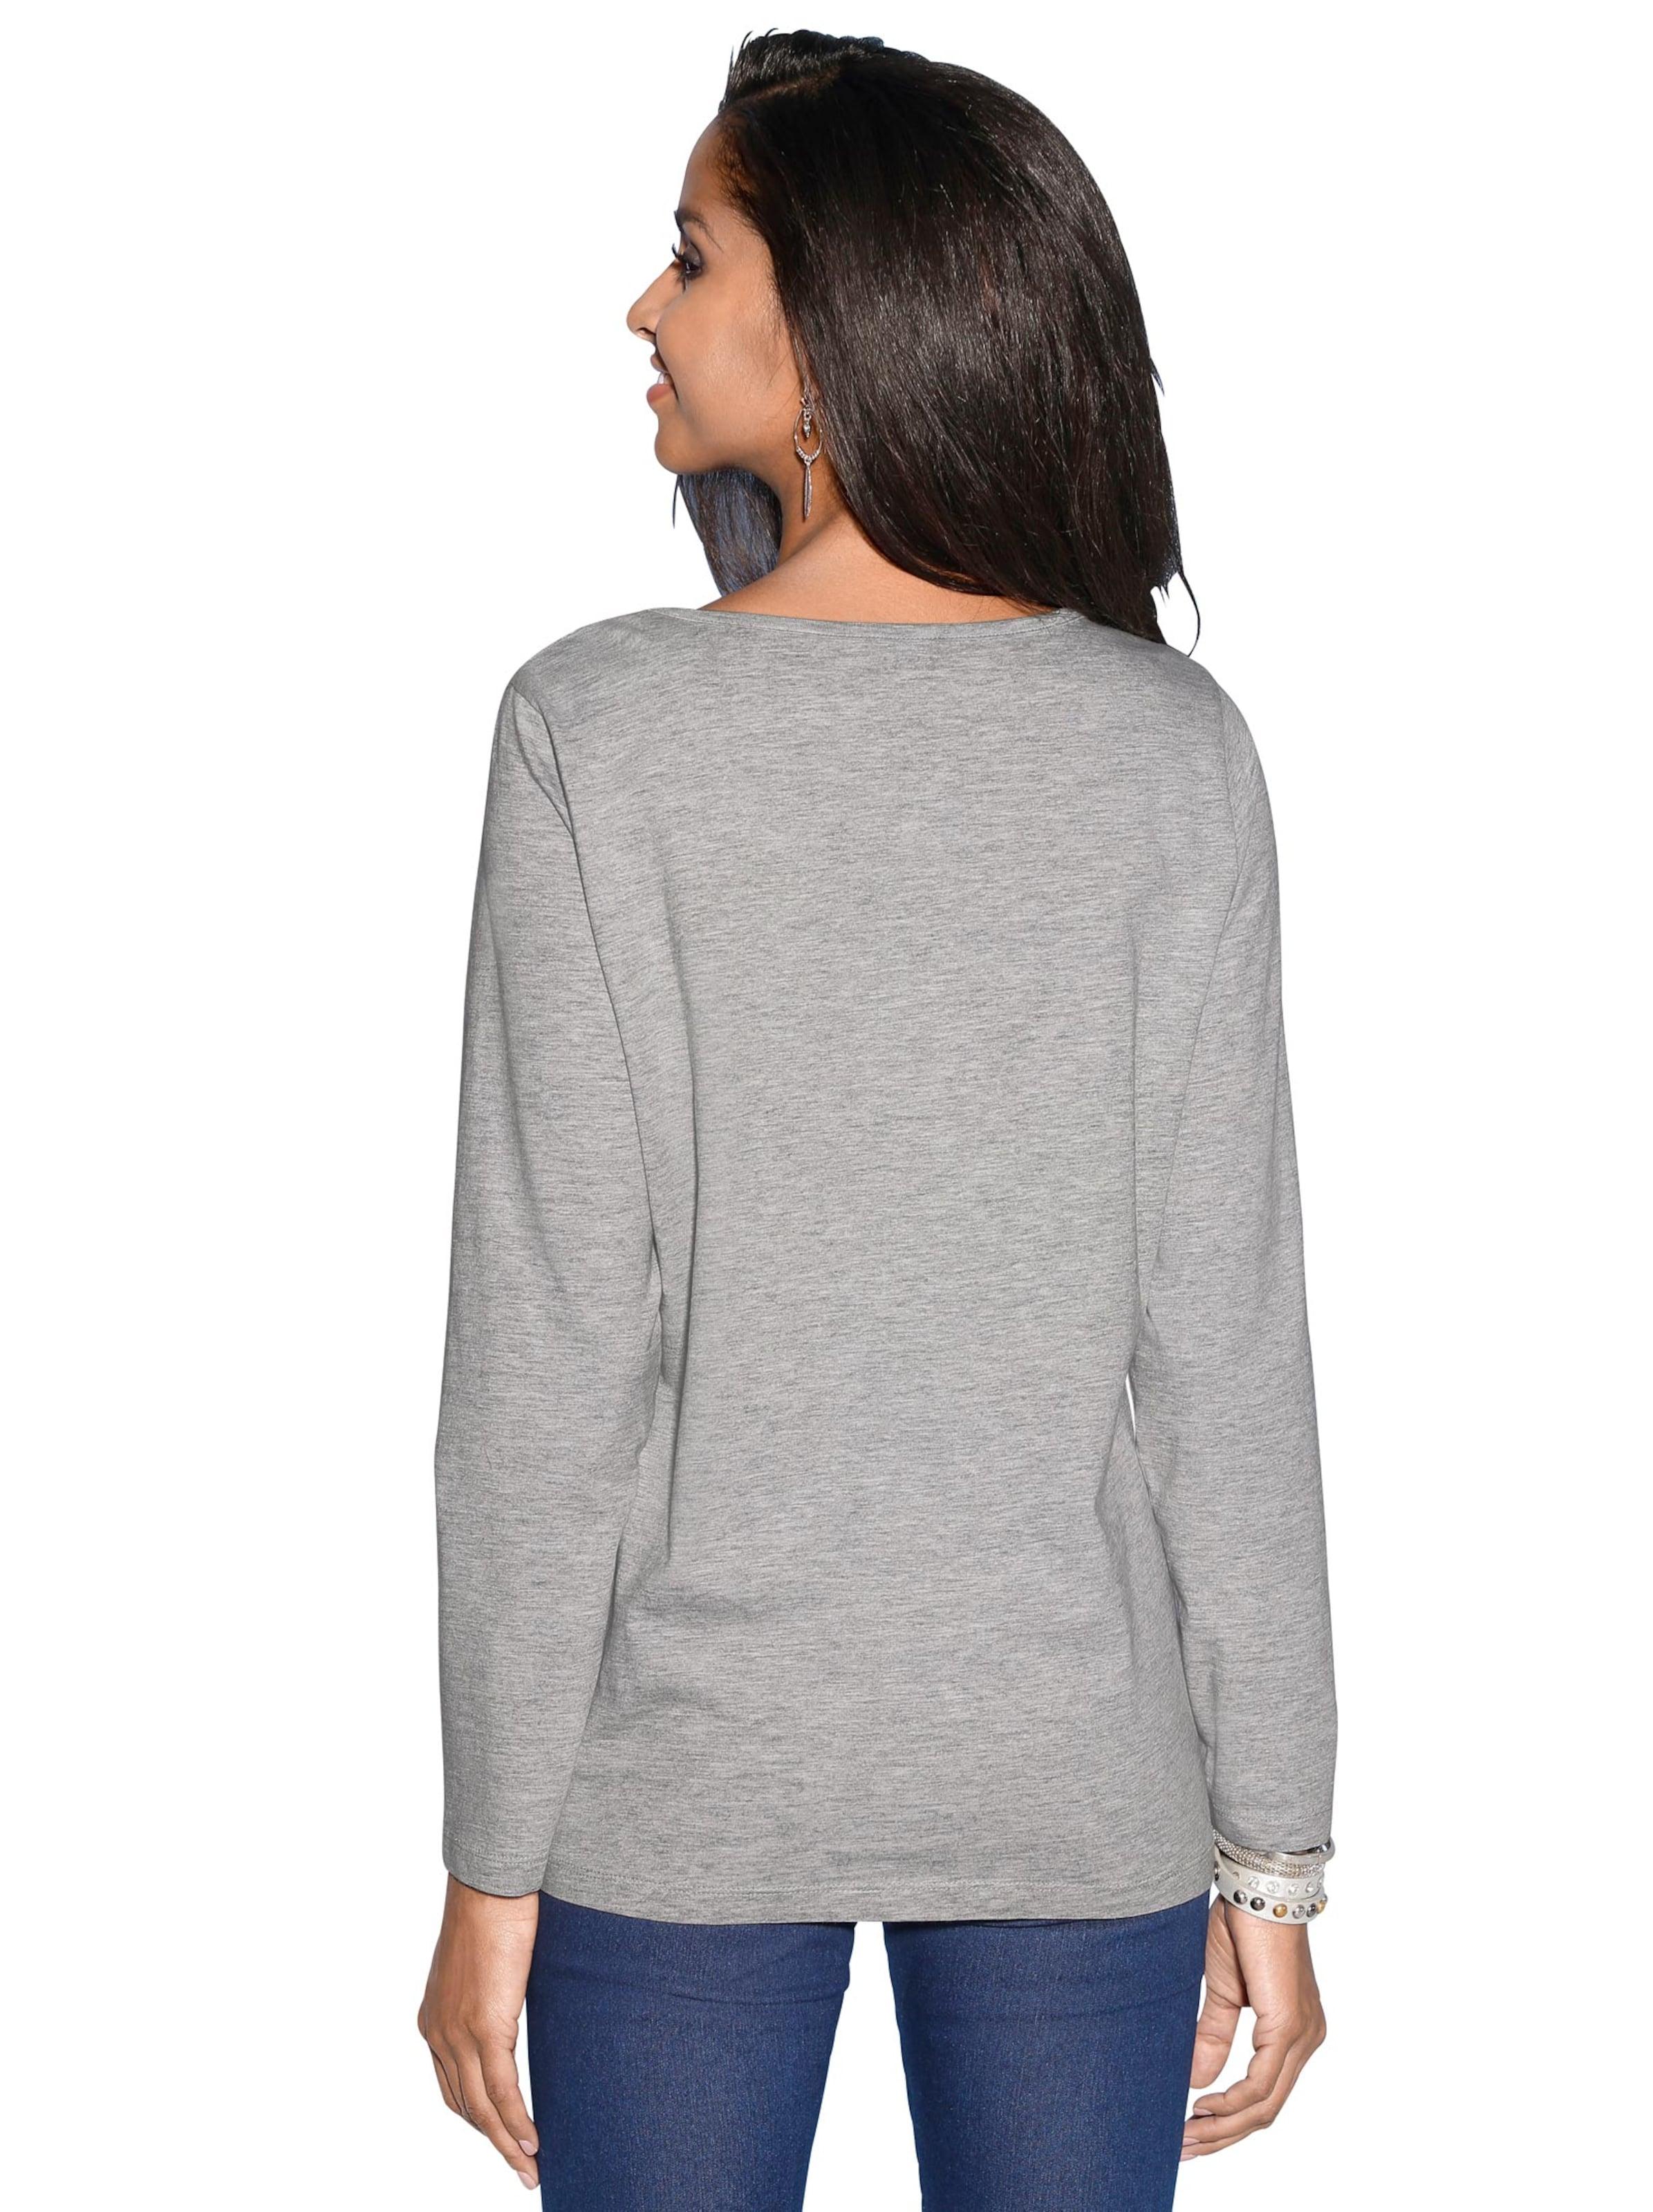 Your Look... for less! Dames Shirt grijs gemêleerd bedrukt Größe